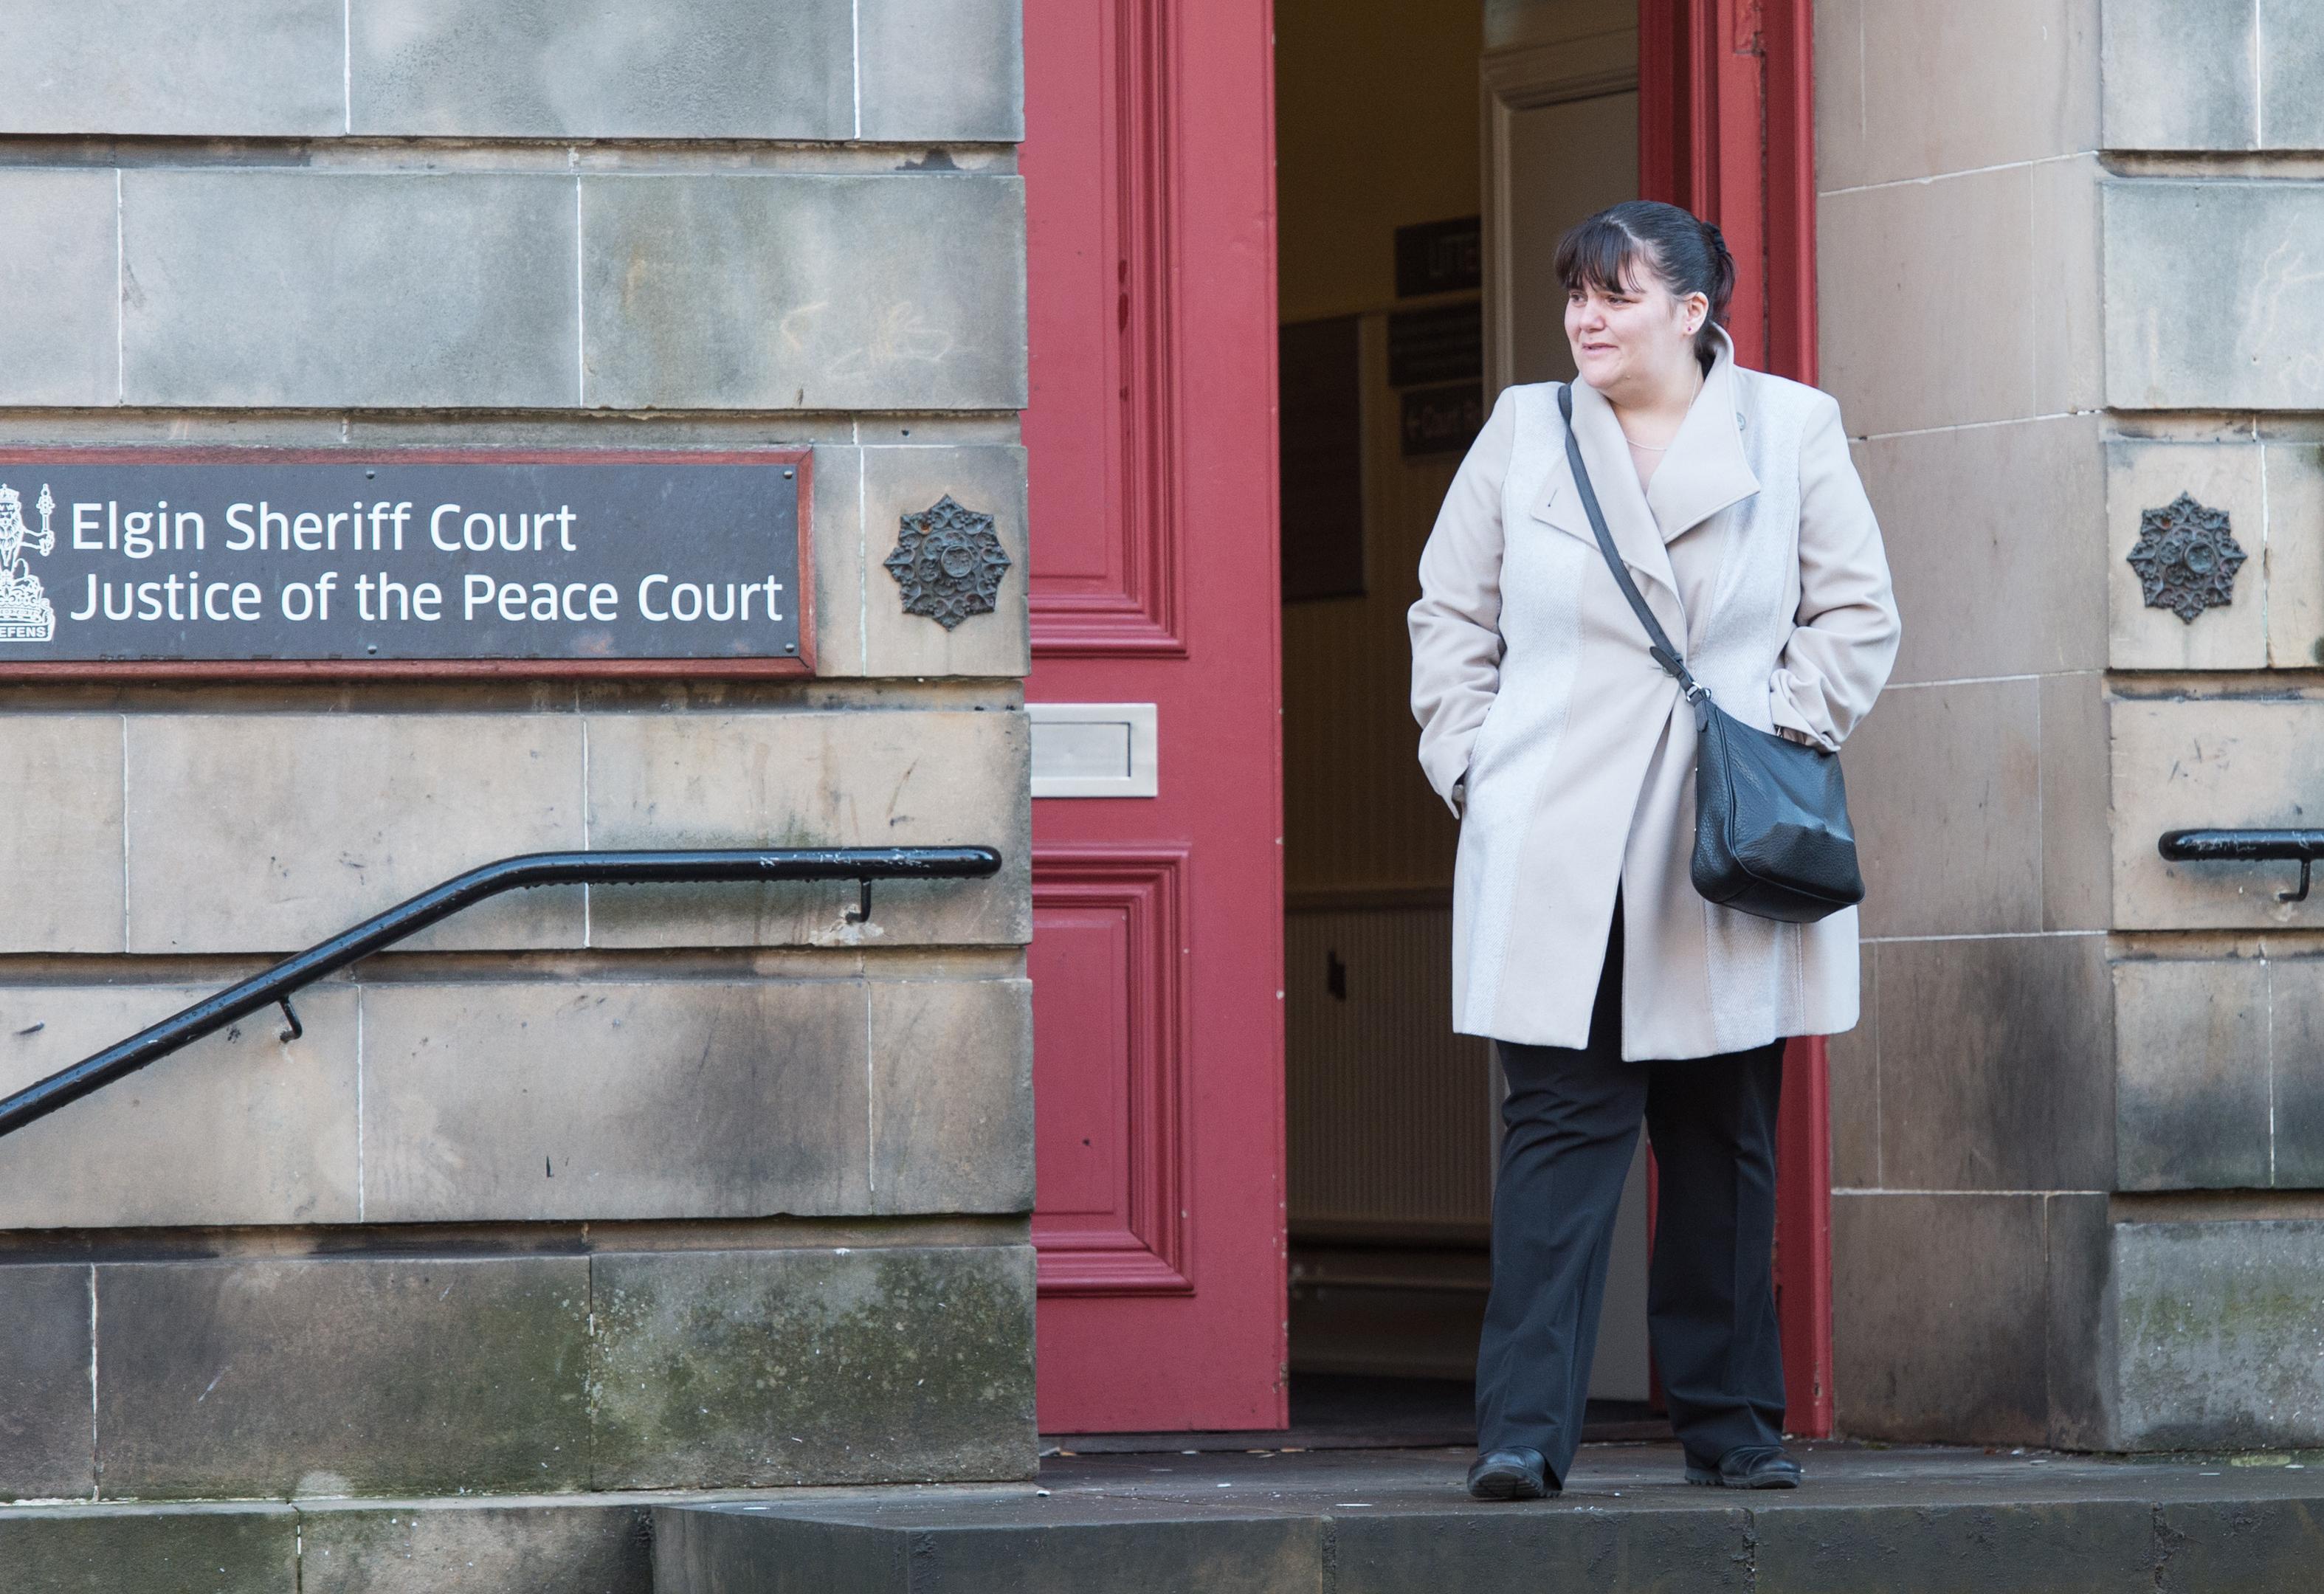 Erynn Buchan leaving Elgin Sheriff Court.